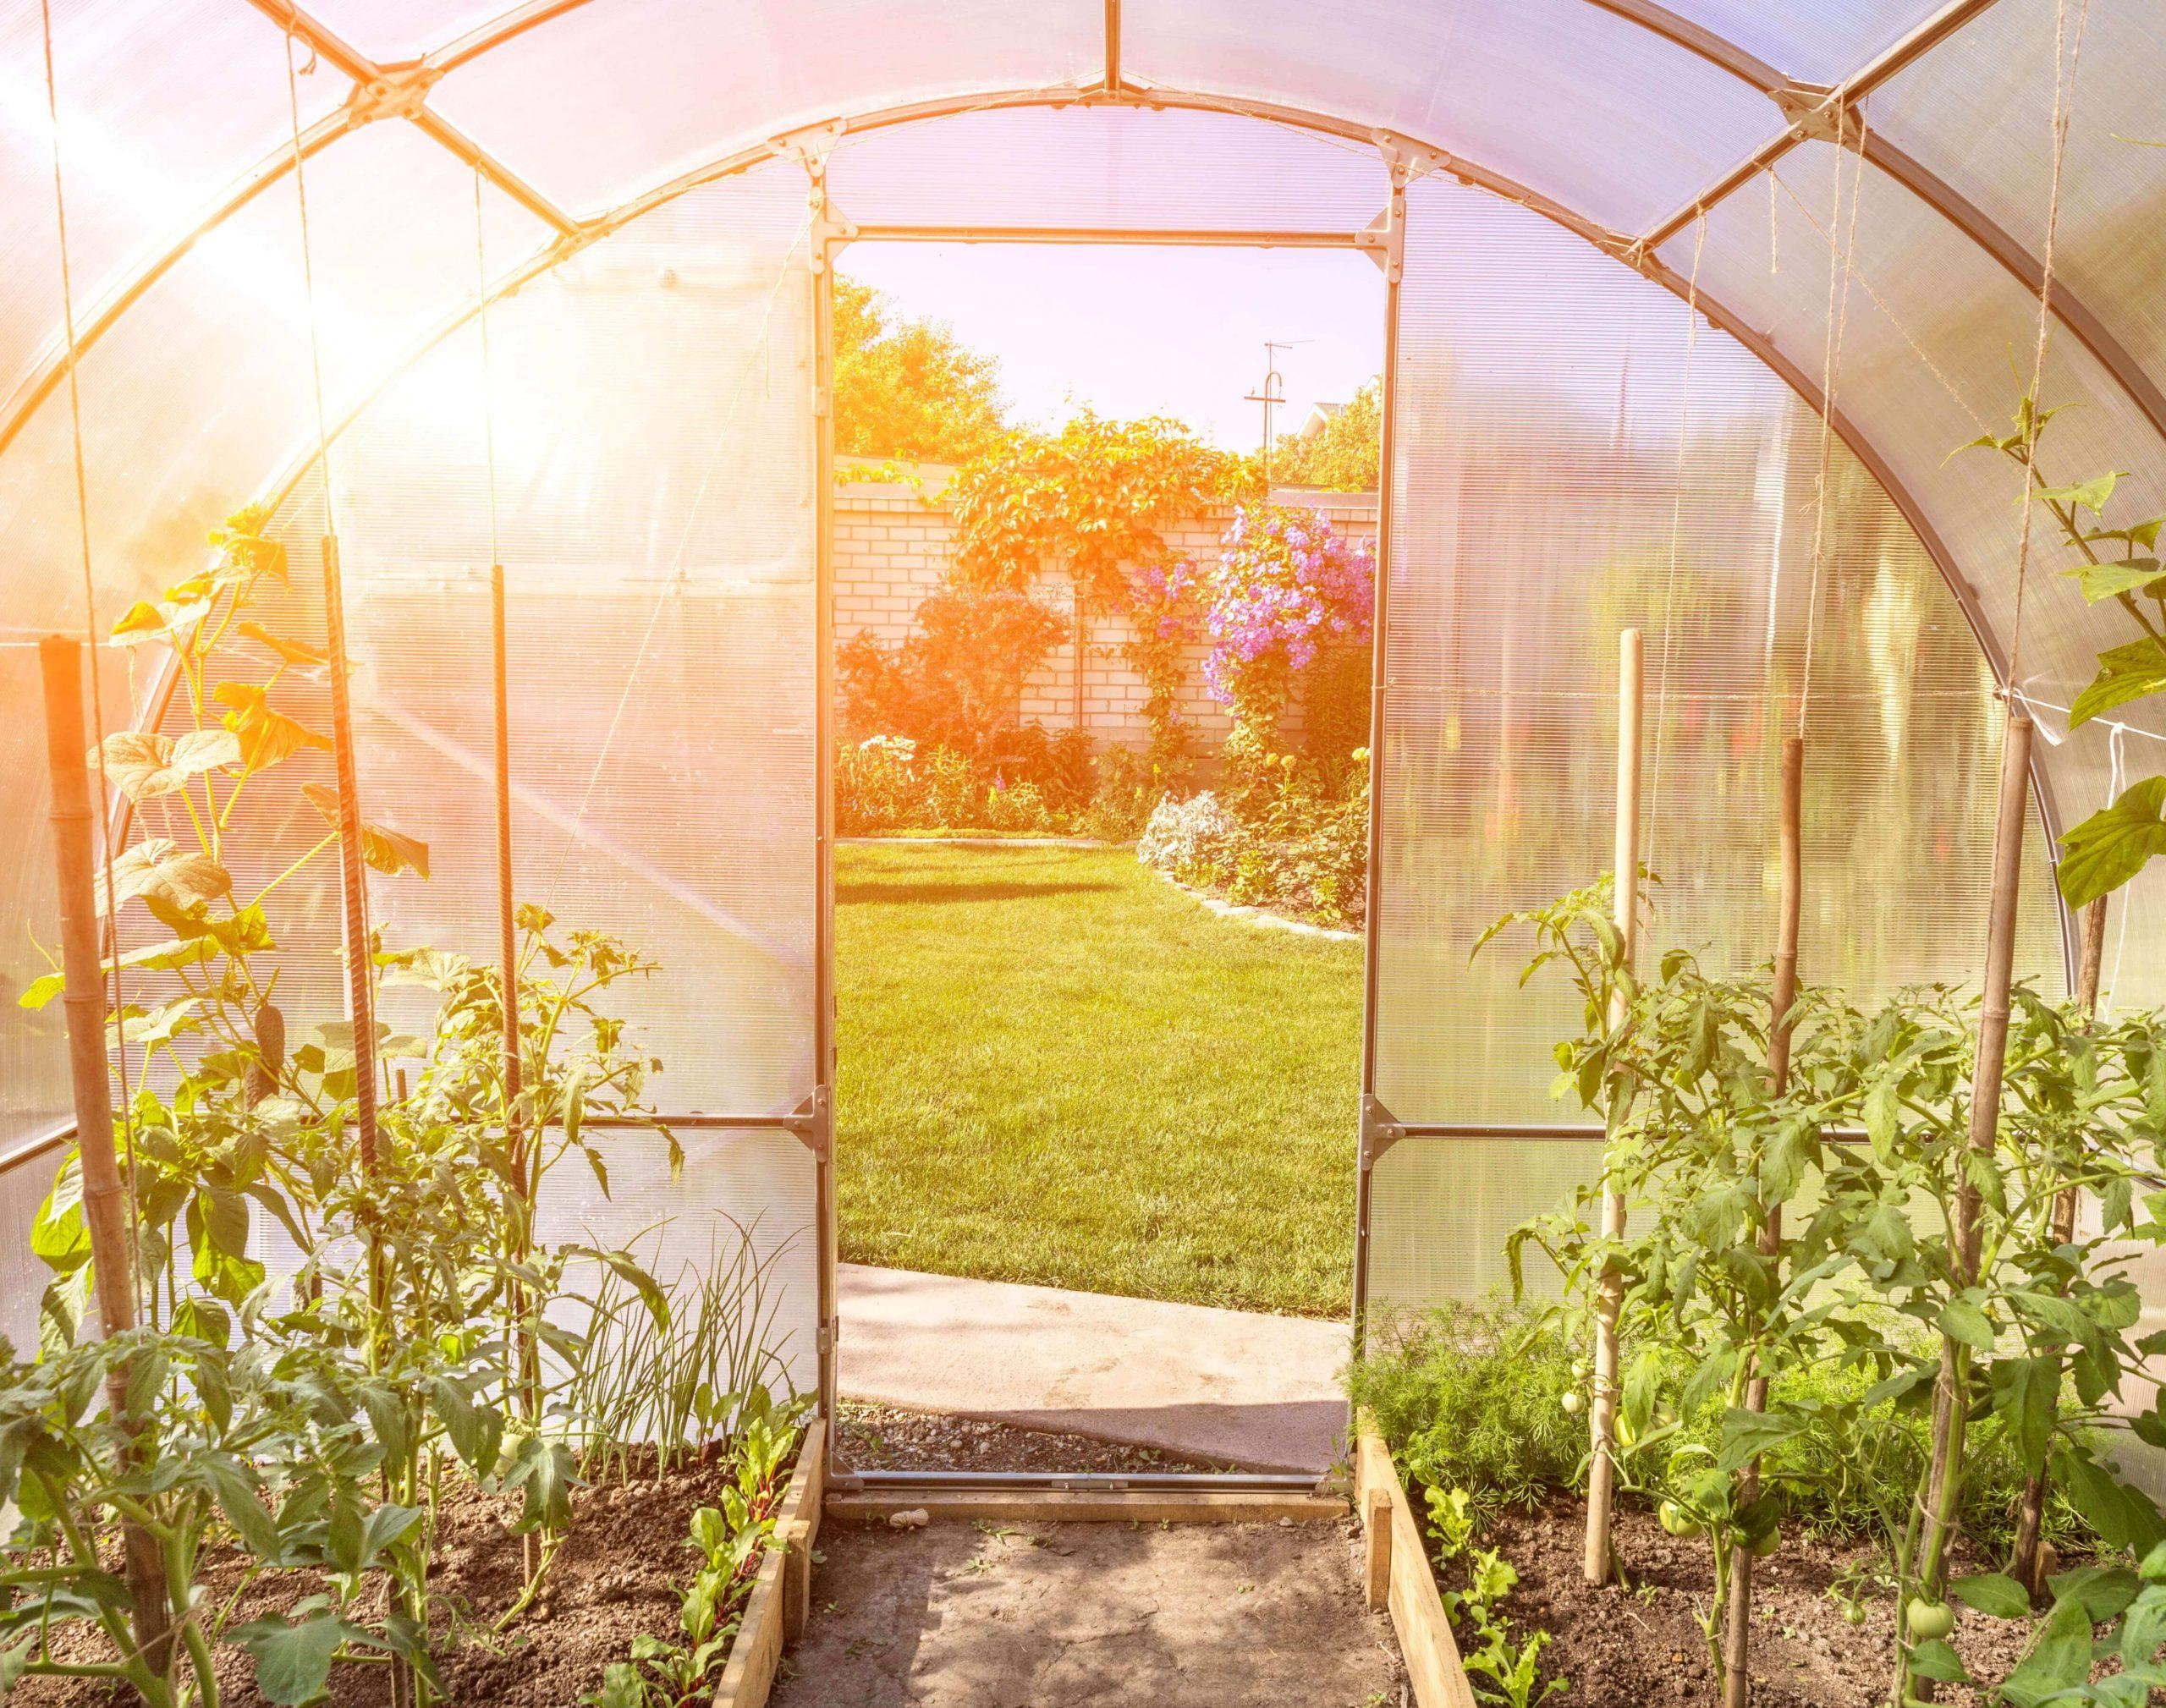 Fabriquer Soi-Même Sa Serre De Jardin - Salon Viving serapportantà Faire Sa Serre De Jardin Soi Meme